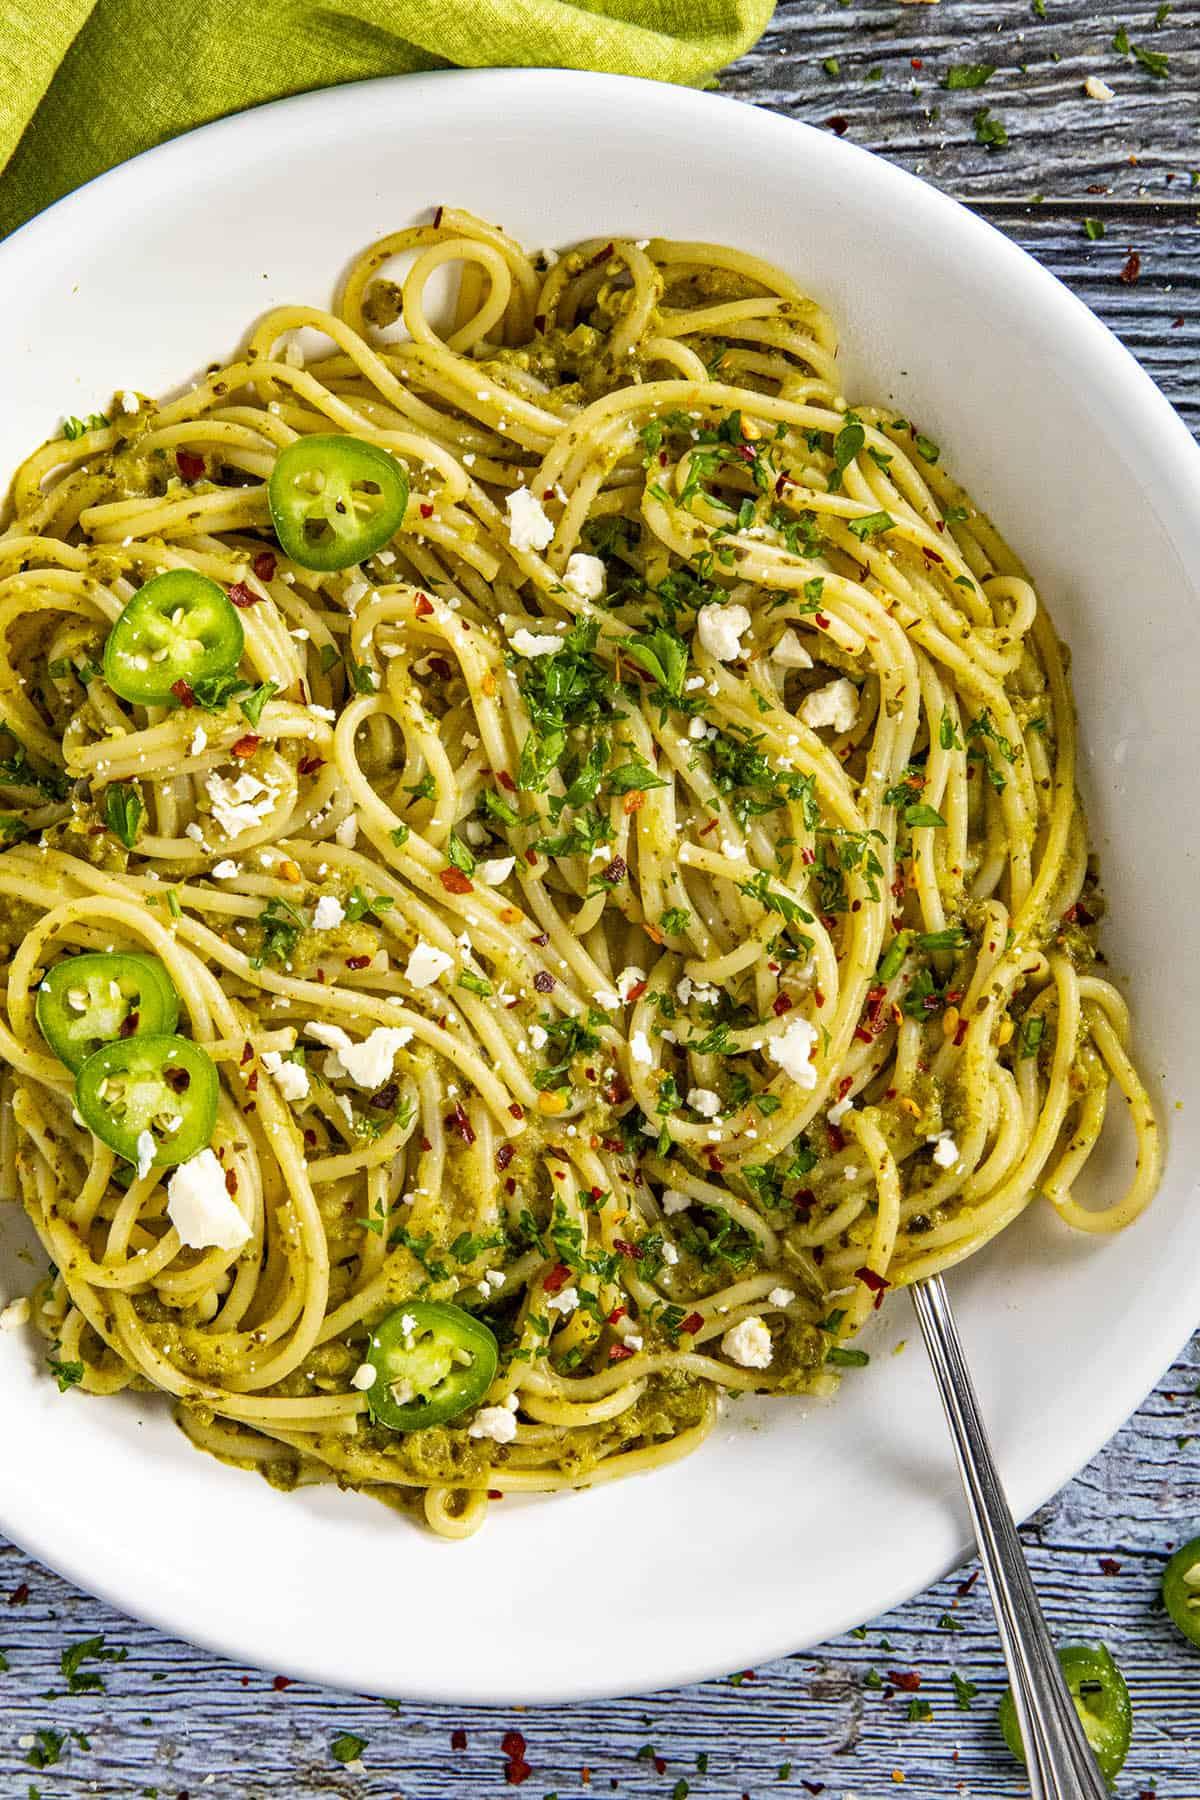 Spaghetti Verde, or